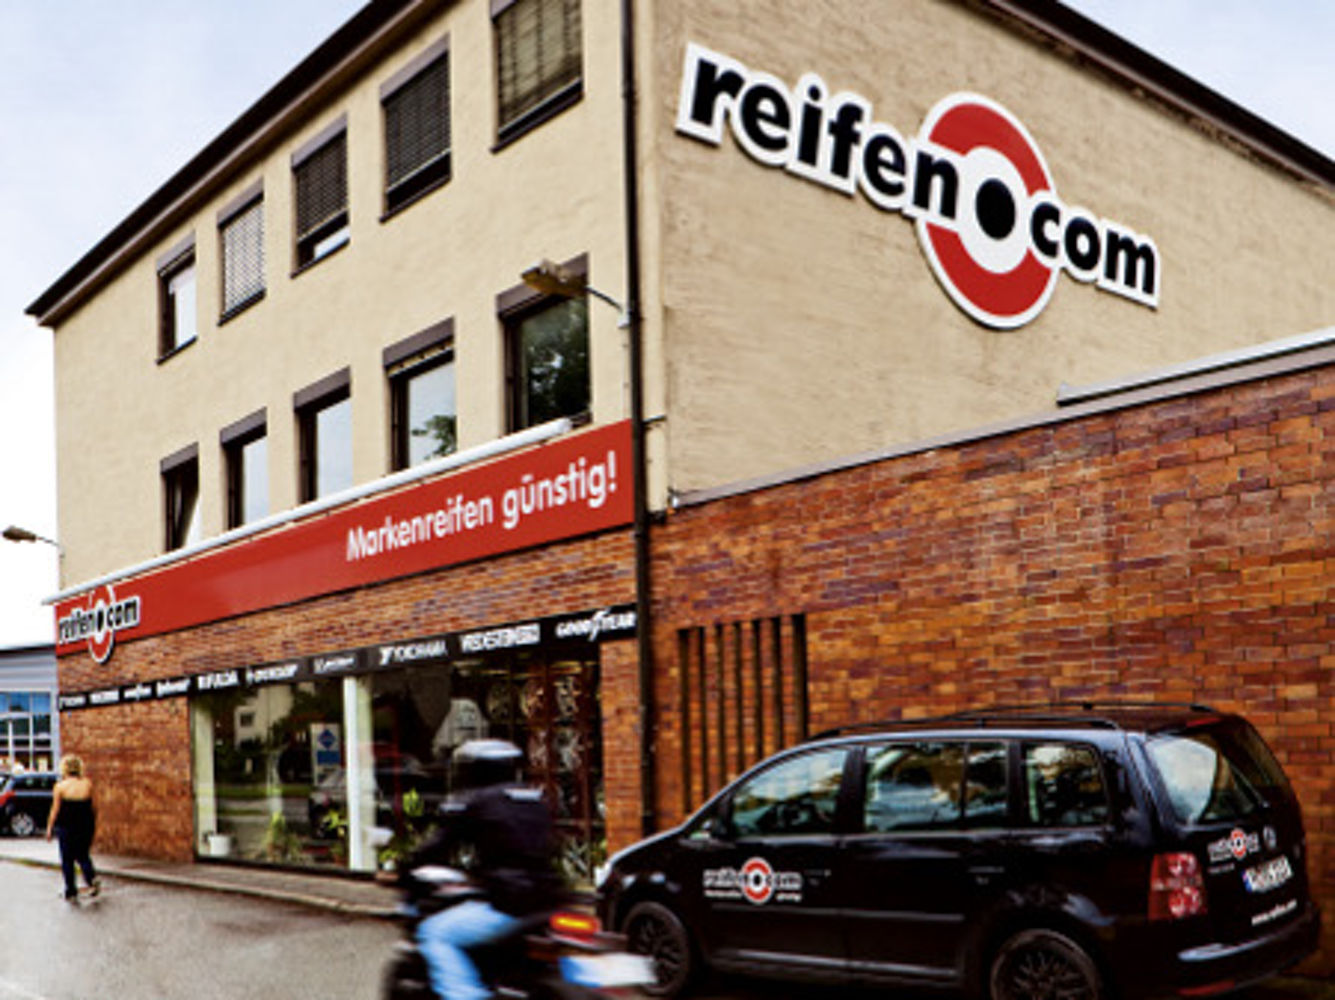 reifen.com-branch in Nürnberg Langwasser